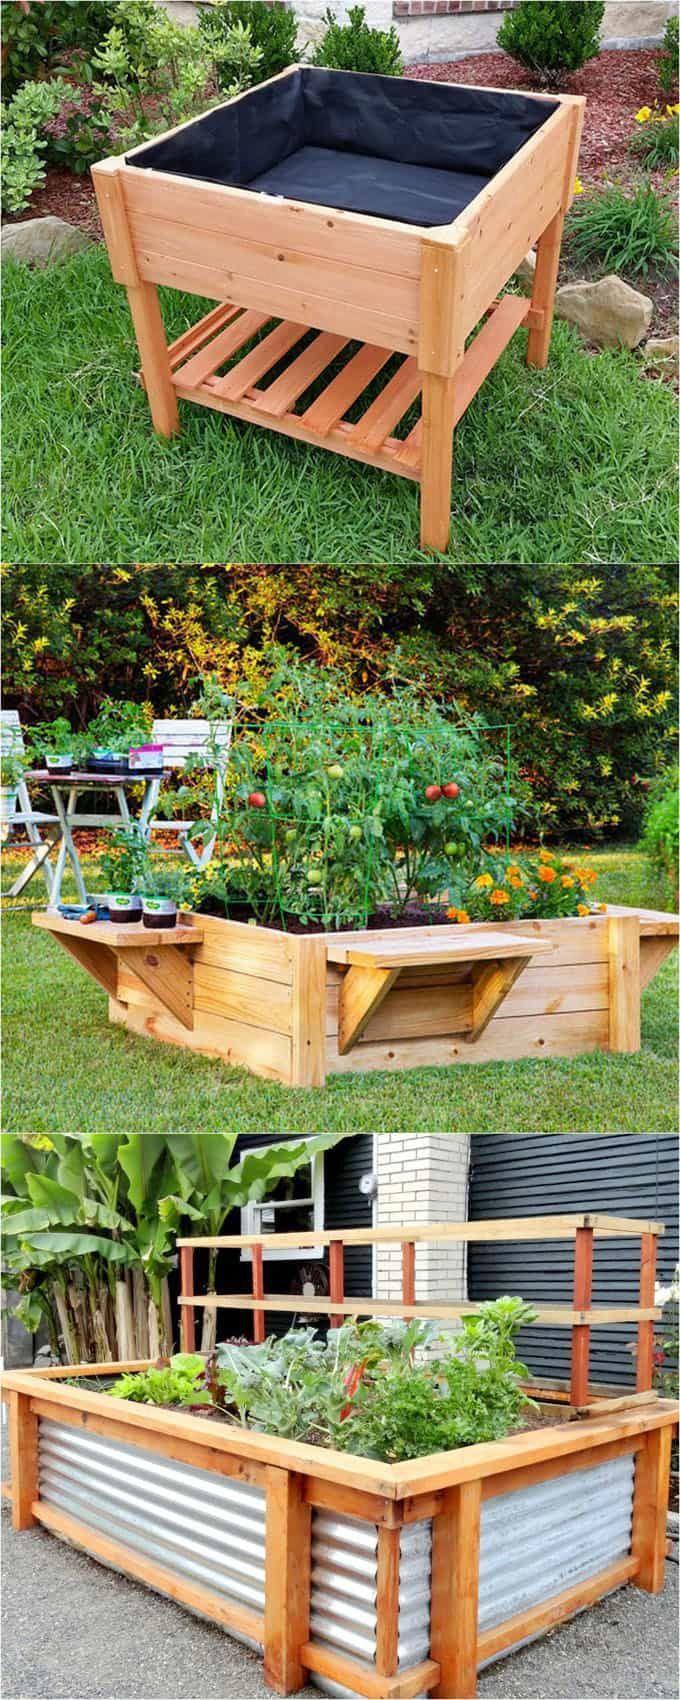 28 Amazing Diy Raised Bed Gardens A Piece Of Rainbow Vegetable